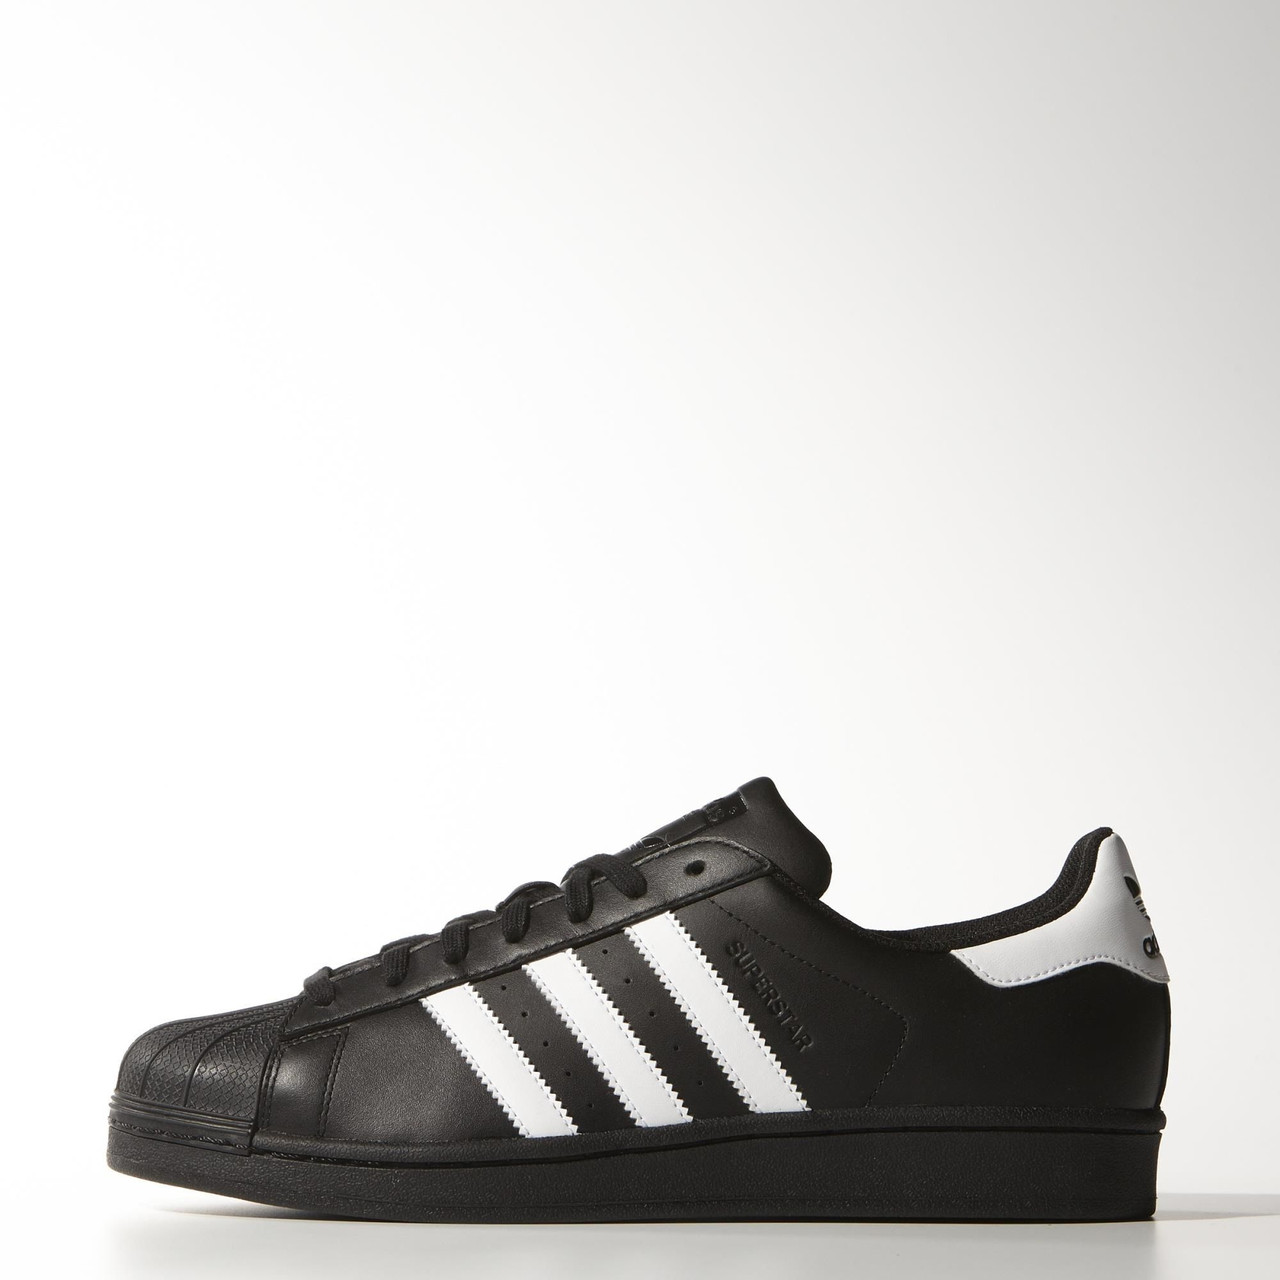 Мужские кроссовки Adidas Superstar (Артикул: B27140)